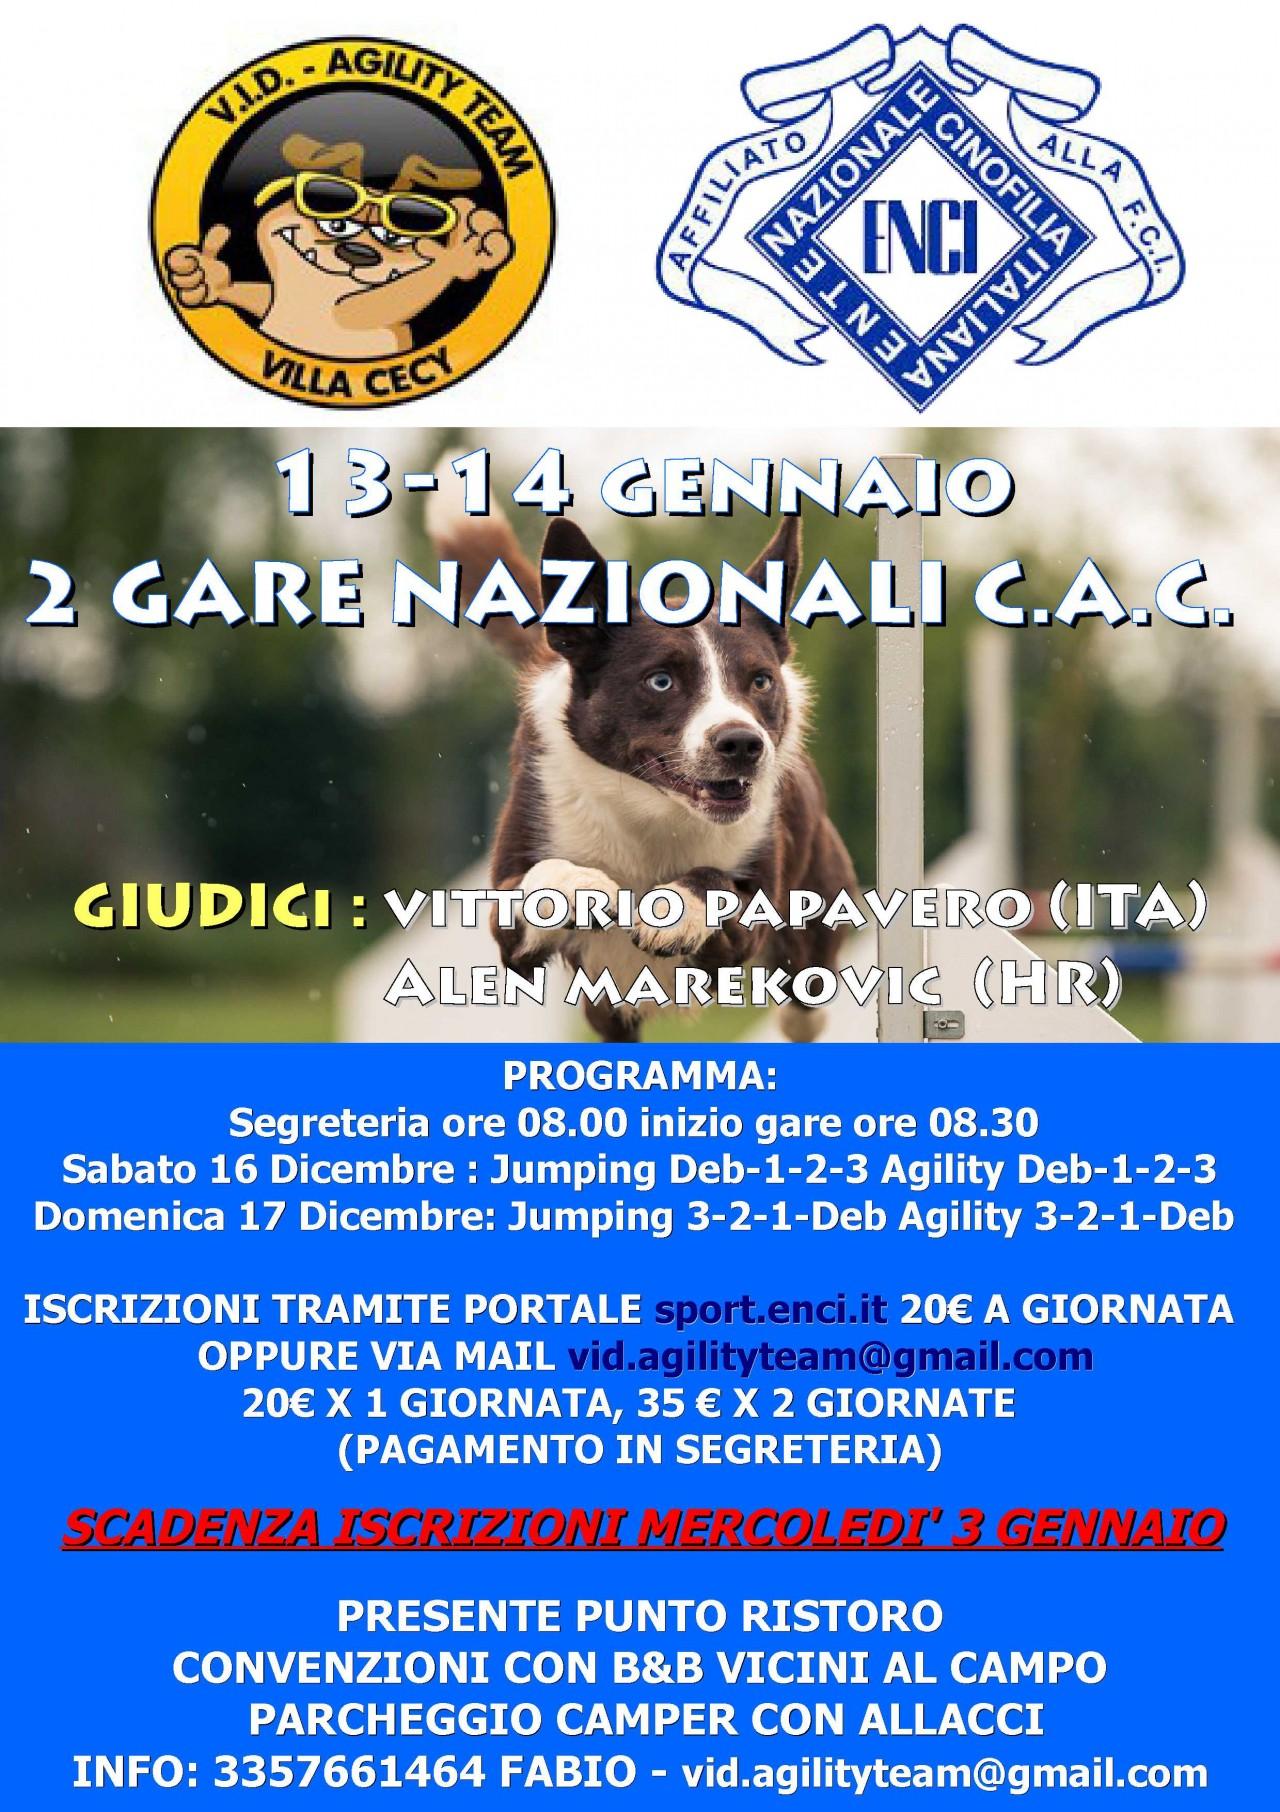 GARA NAZIONALE C.A.C. DOMENICA 14 GENNAIO